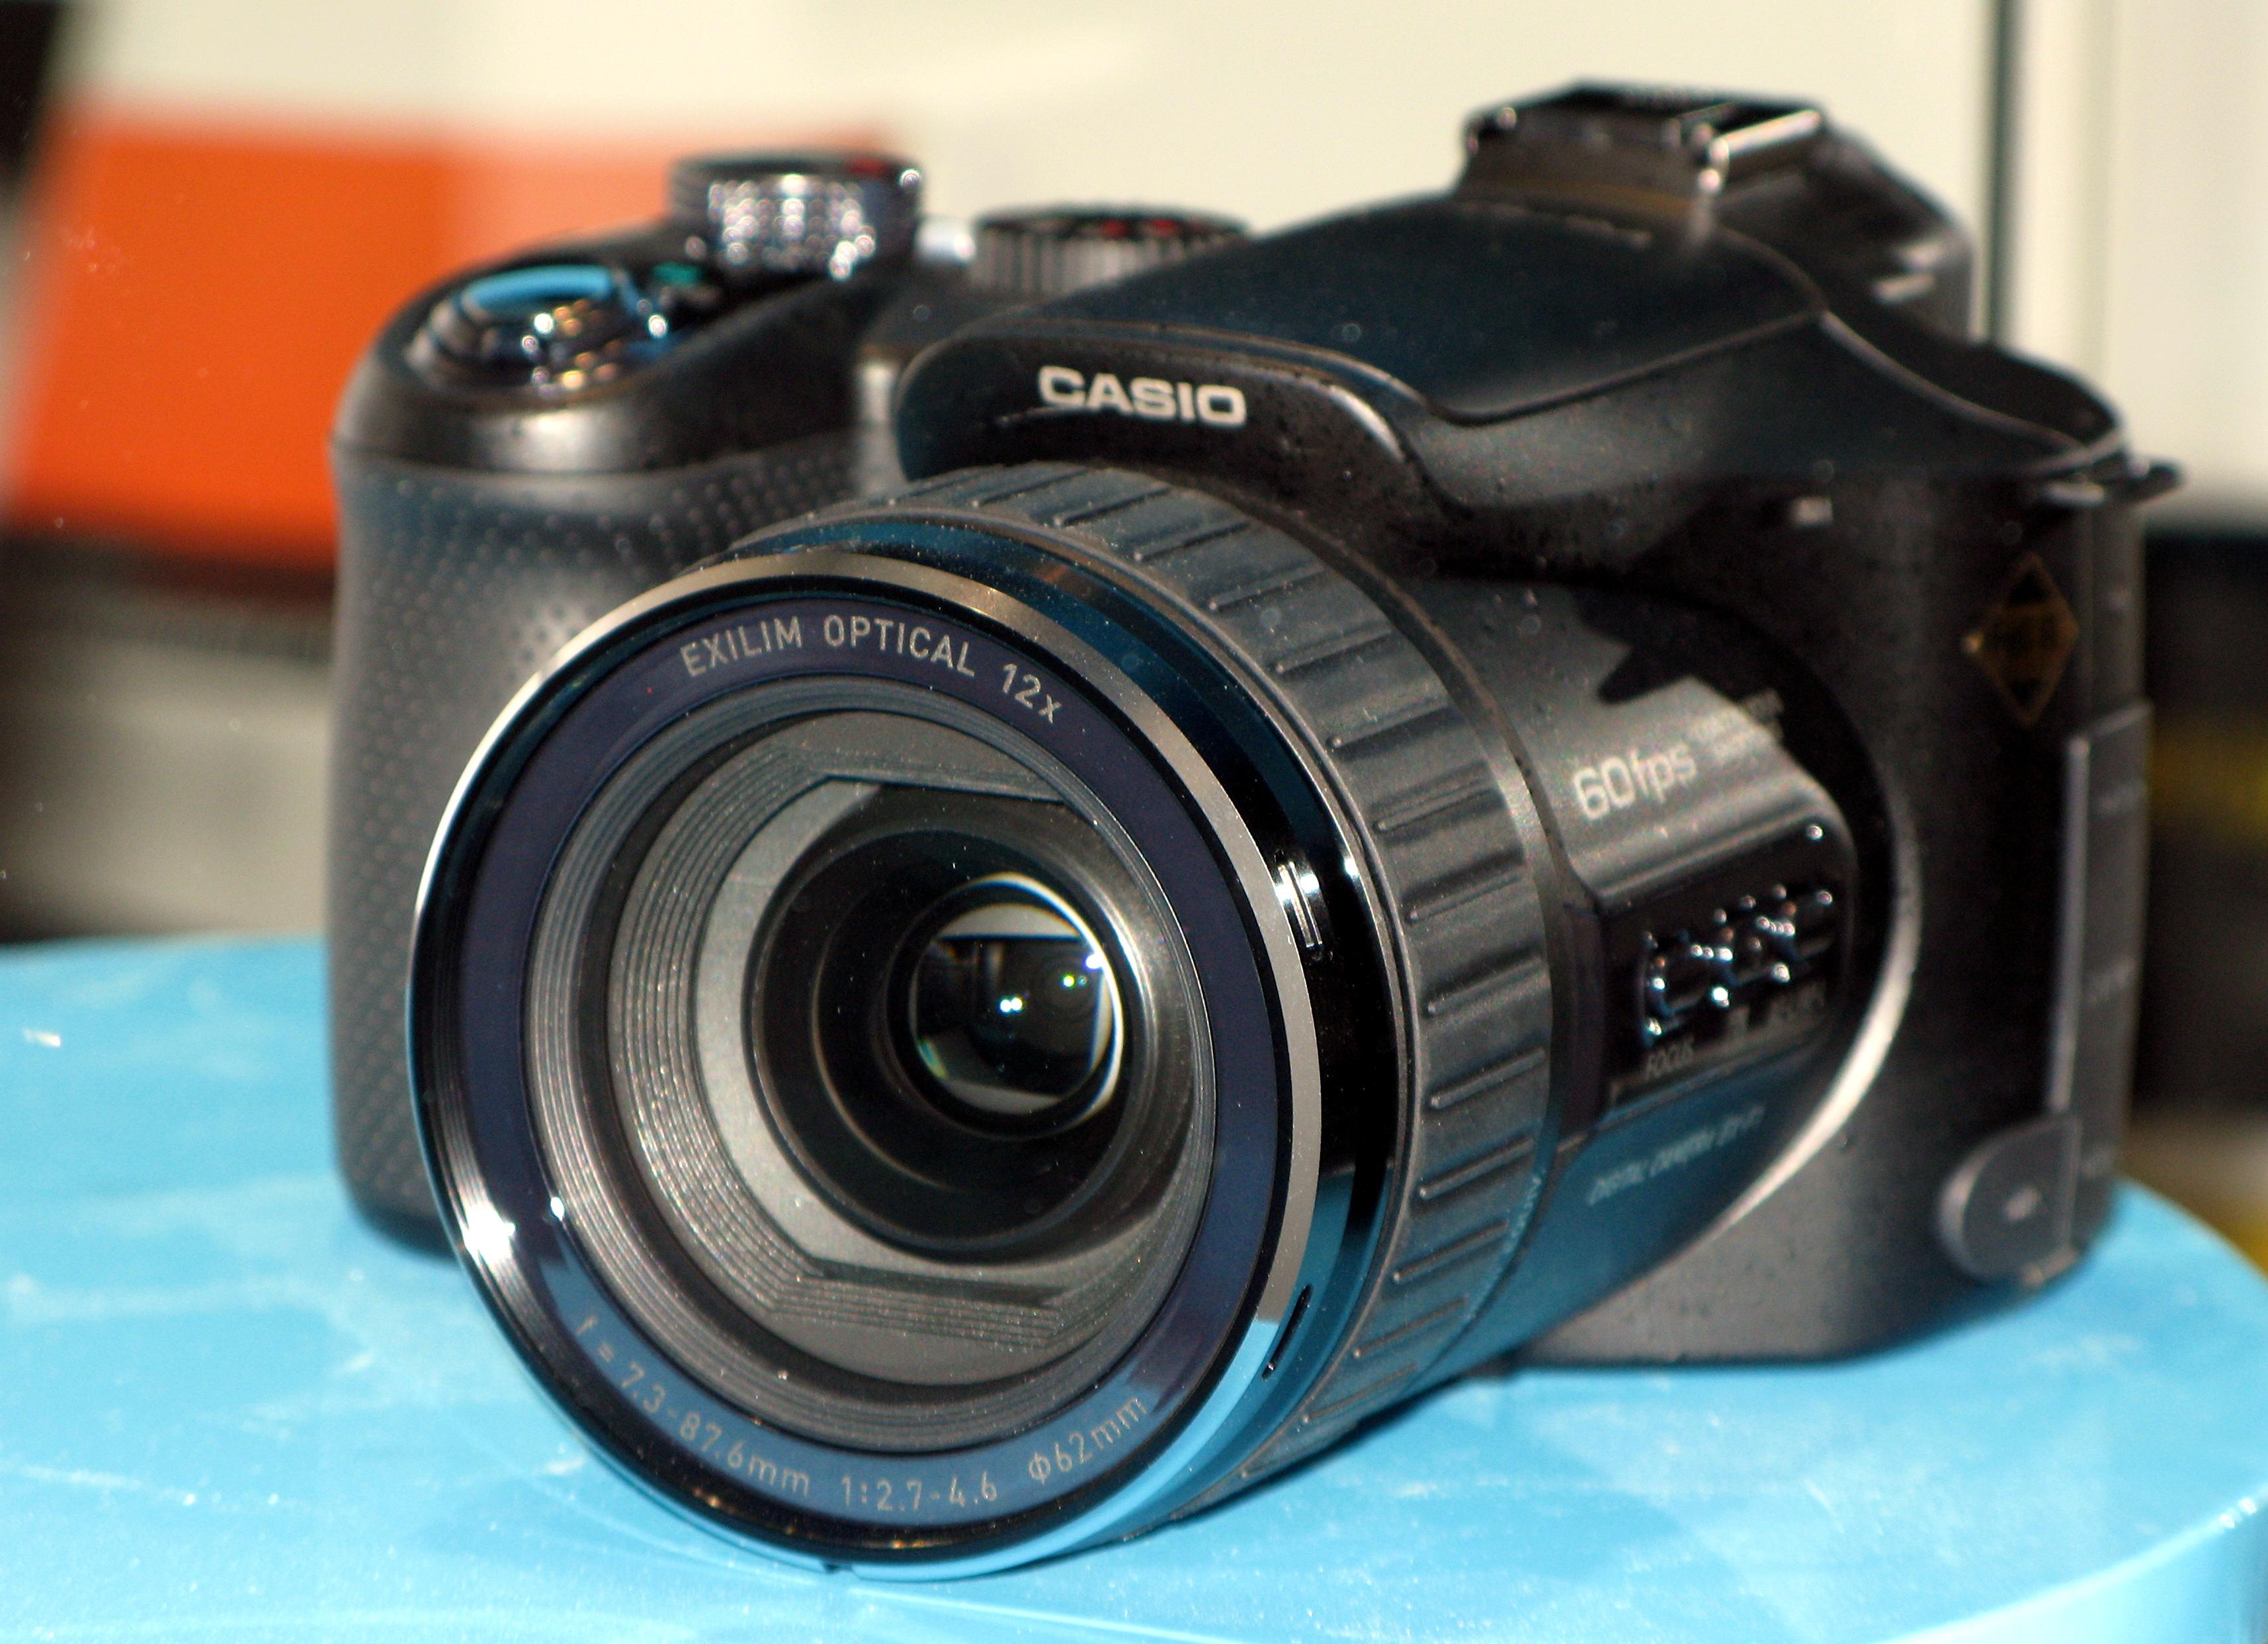 file casio exilim ex f1 img 1761 jpg wikimedia commons rh commons wikimedia org casio exilim pro ex-f1 manual casio exilim pro ex-f1 digital camera manual